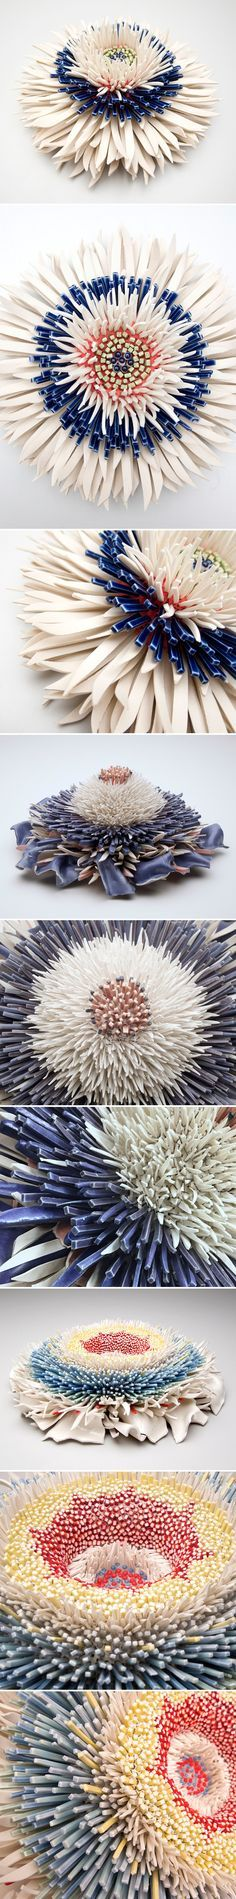 ceramic flowers by zemer peled